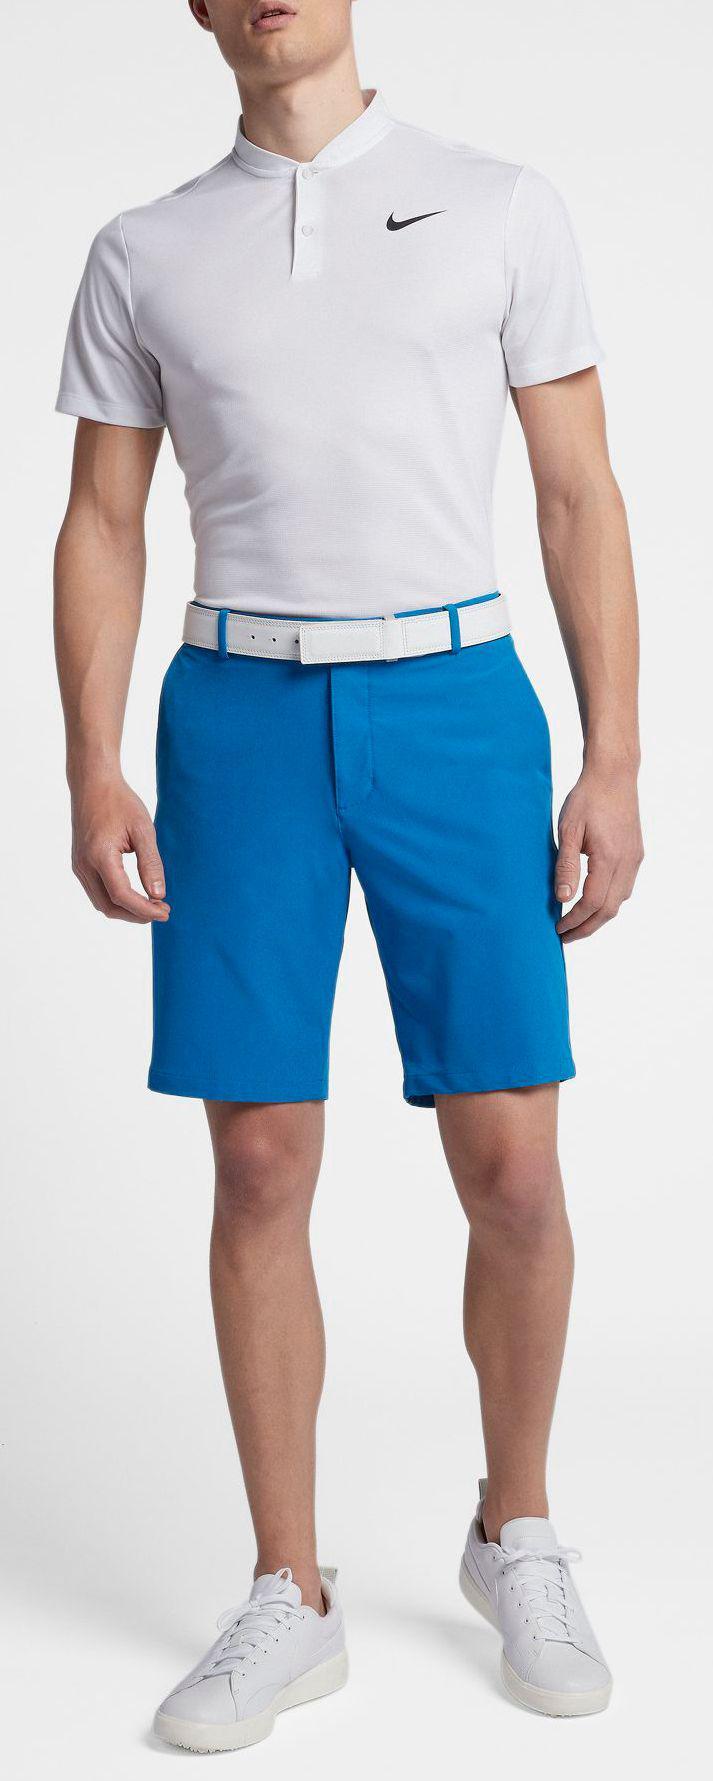 a6b12d82e5e4 Lyst - Nike Solid Slim Fit Flex Golf Shorts in Blue for Men